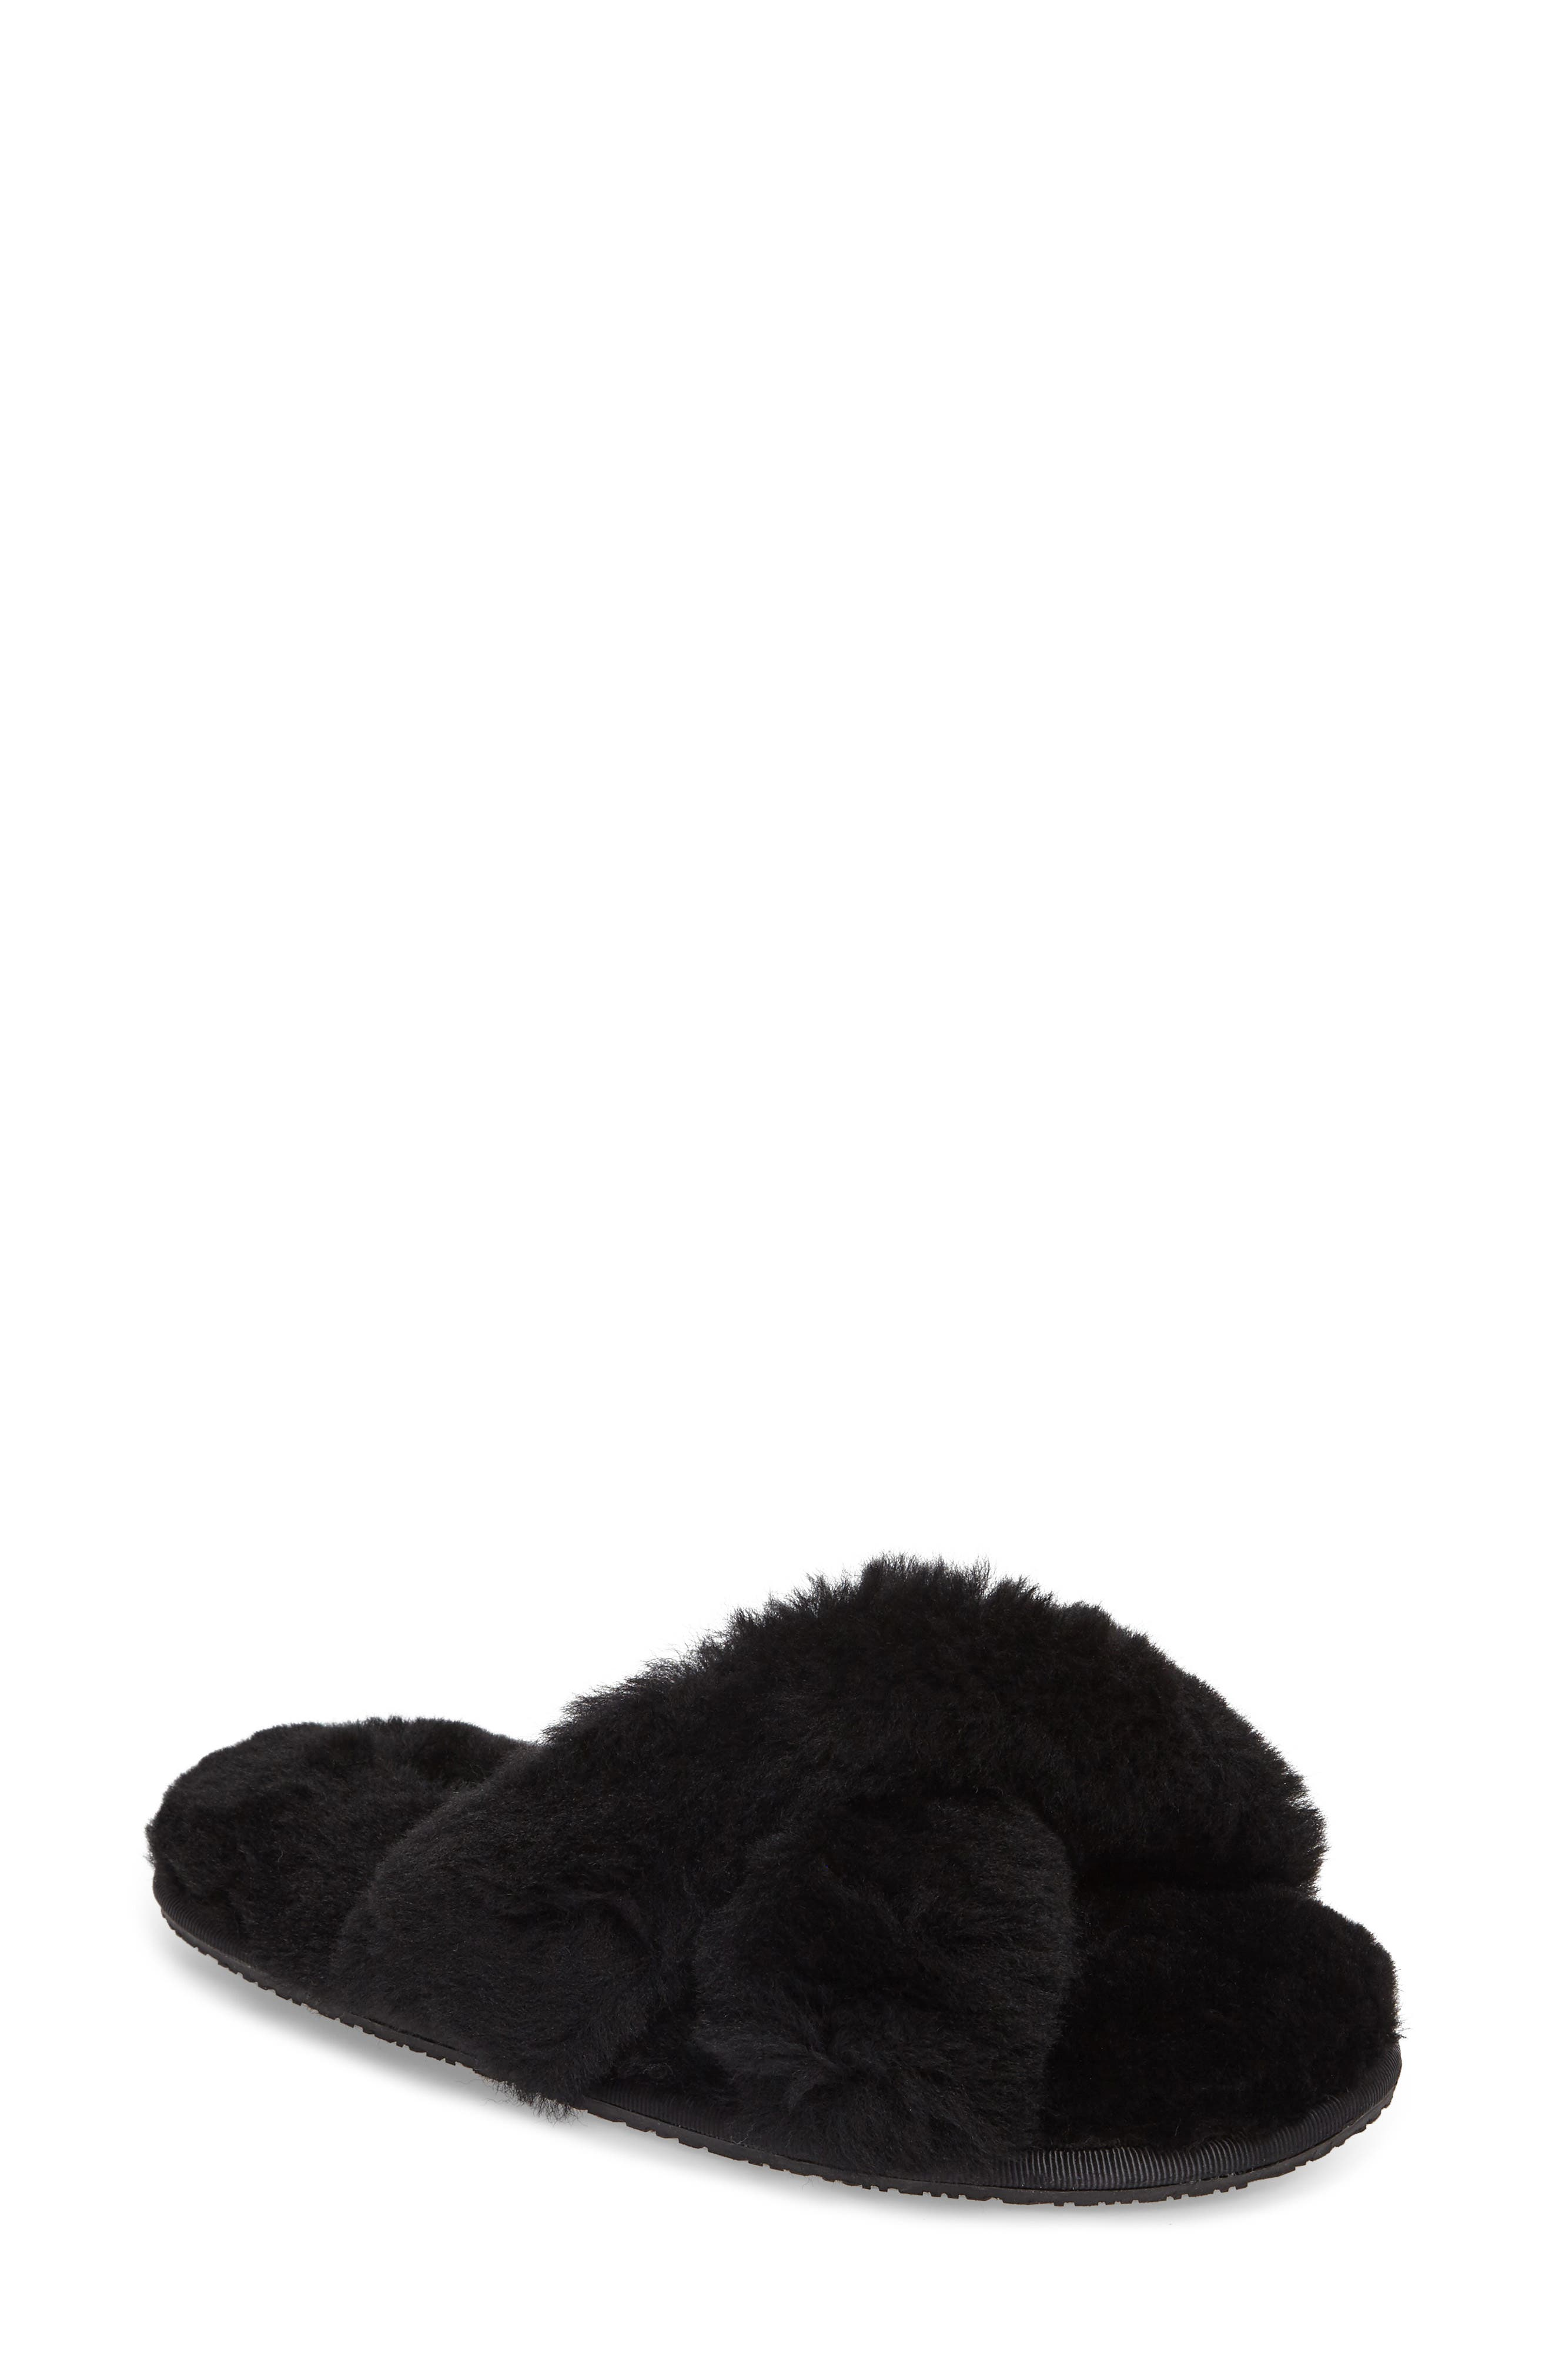 Mt. Hood Genuine Shearling Slipper,                         Main,                         color, BLACK